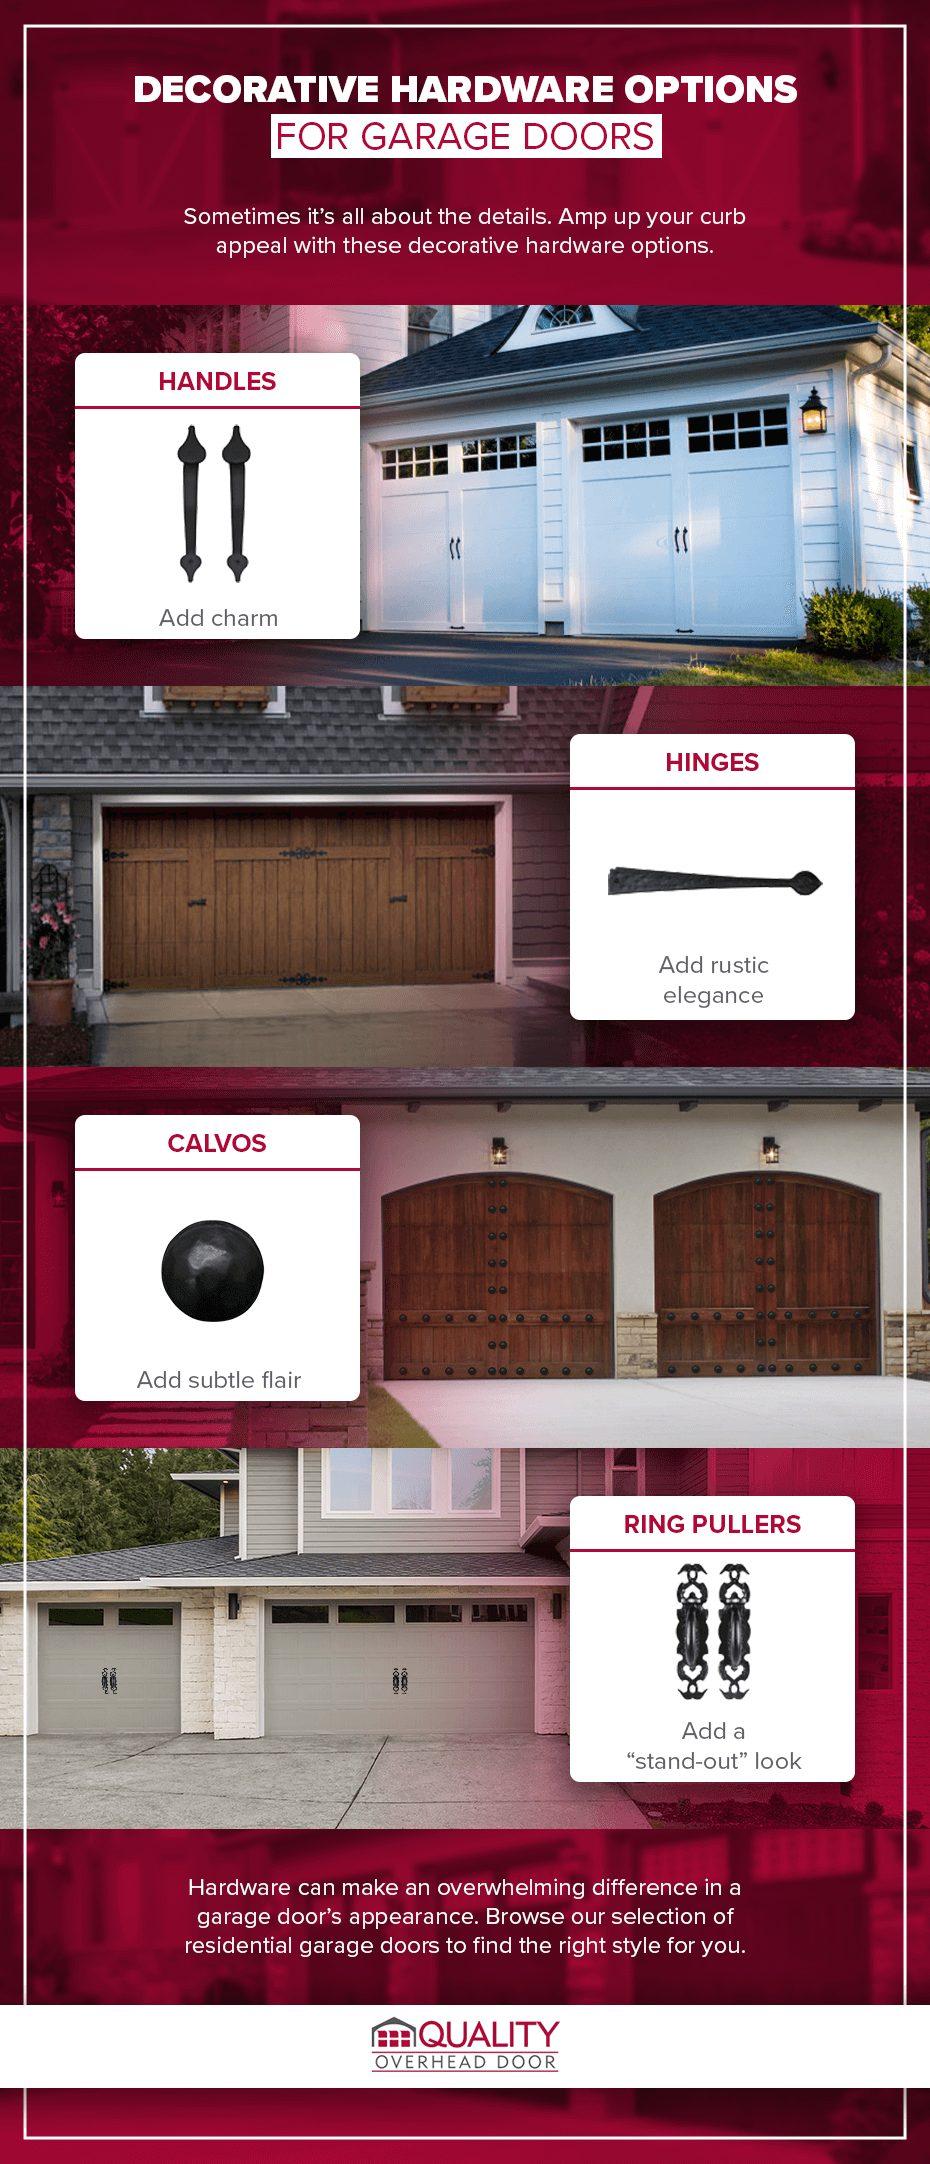 Decorative Hardware Options for Garage Doors